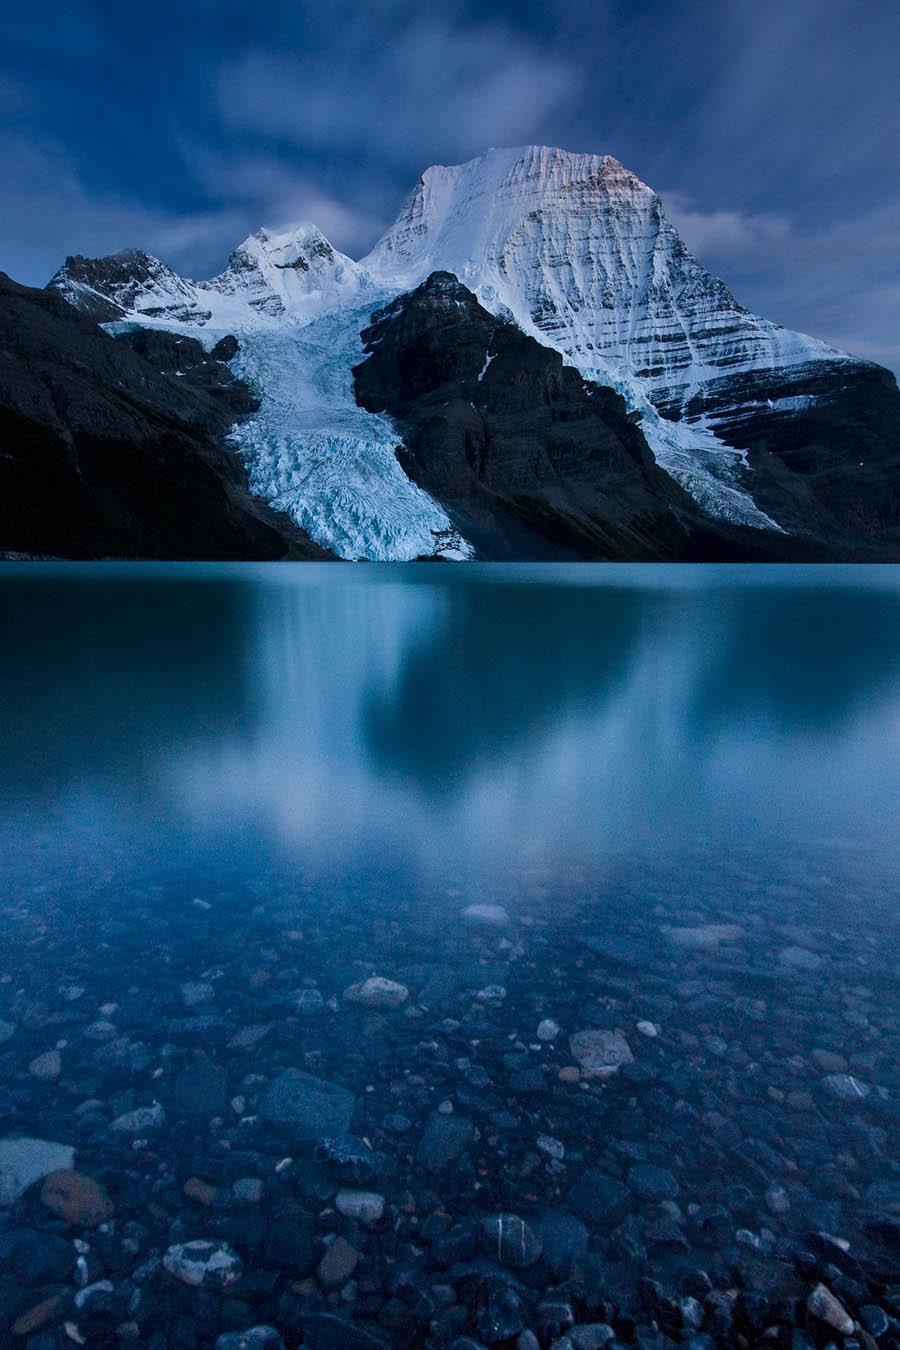 Mount Robson Twilight – Photo by Jeffrey Pang